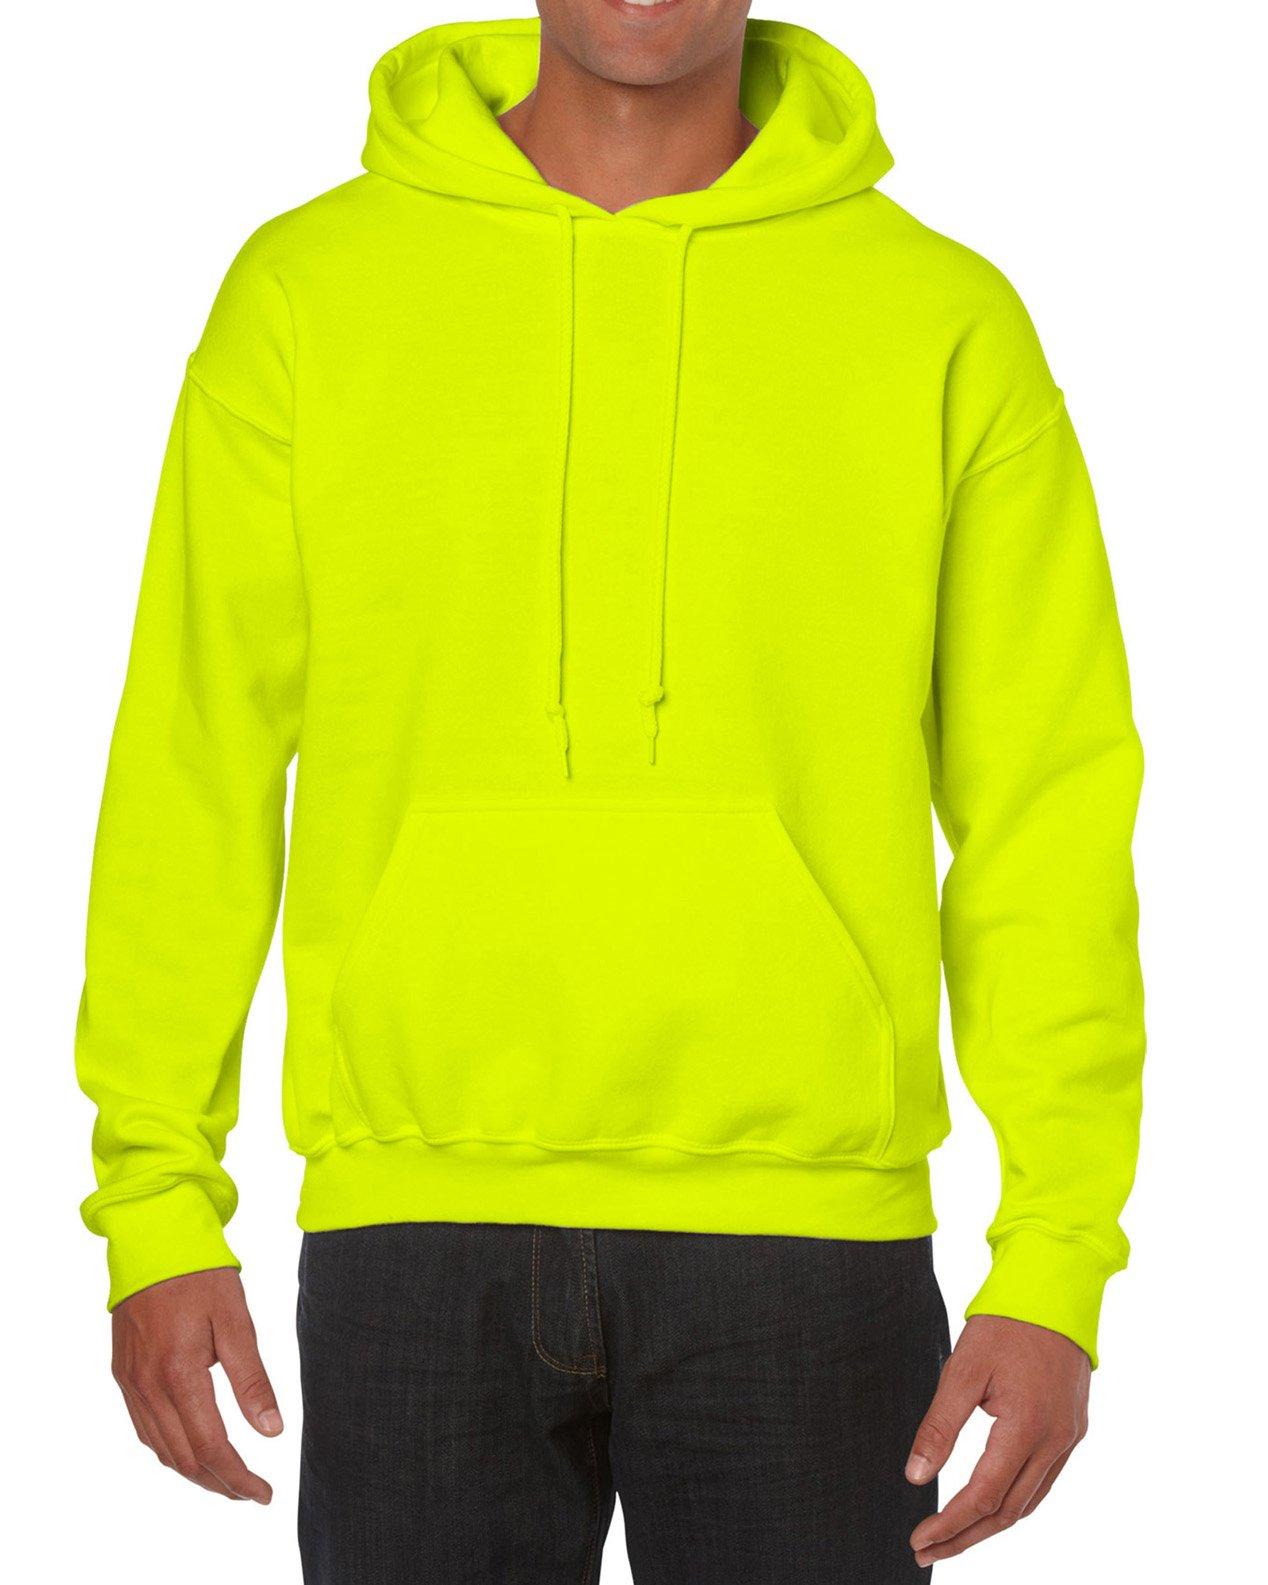 Gildan Men's Heavy Blend Fleece Hooded Sweatshirt G18500, Safety Green, Small